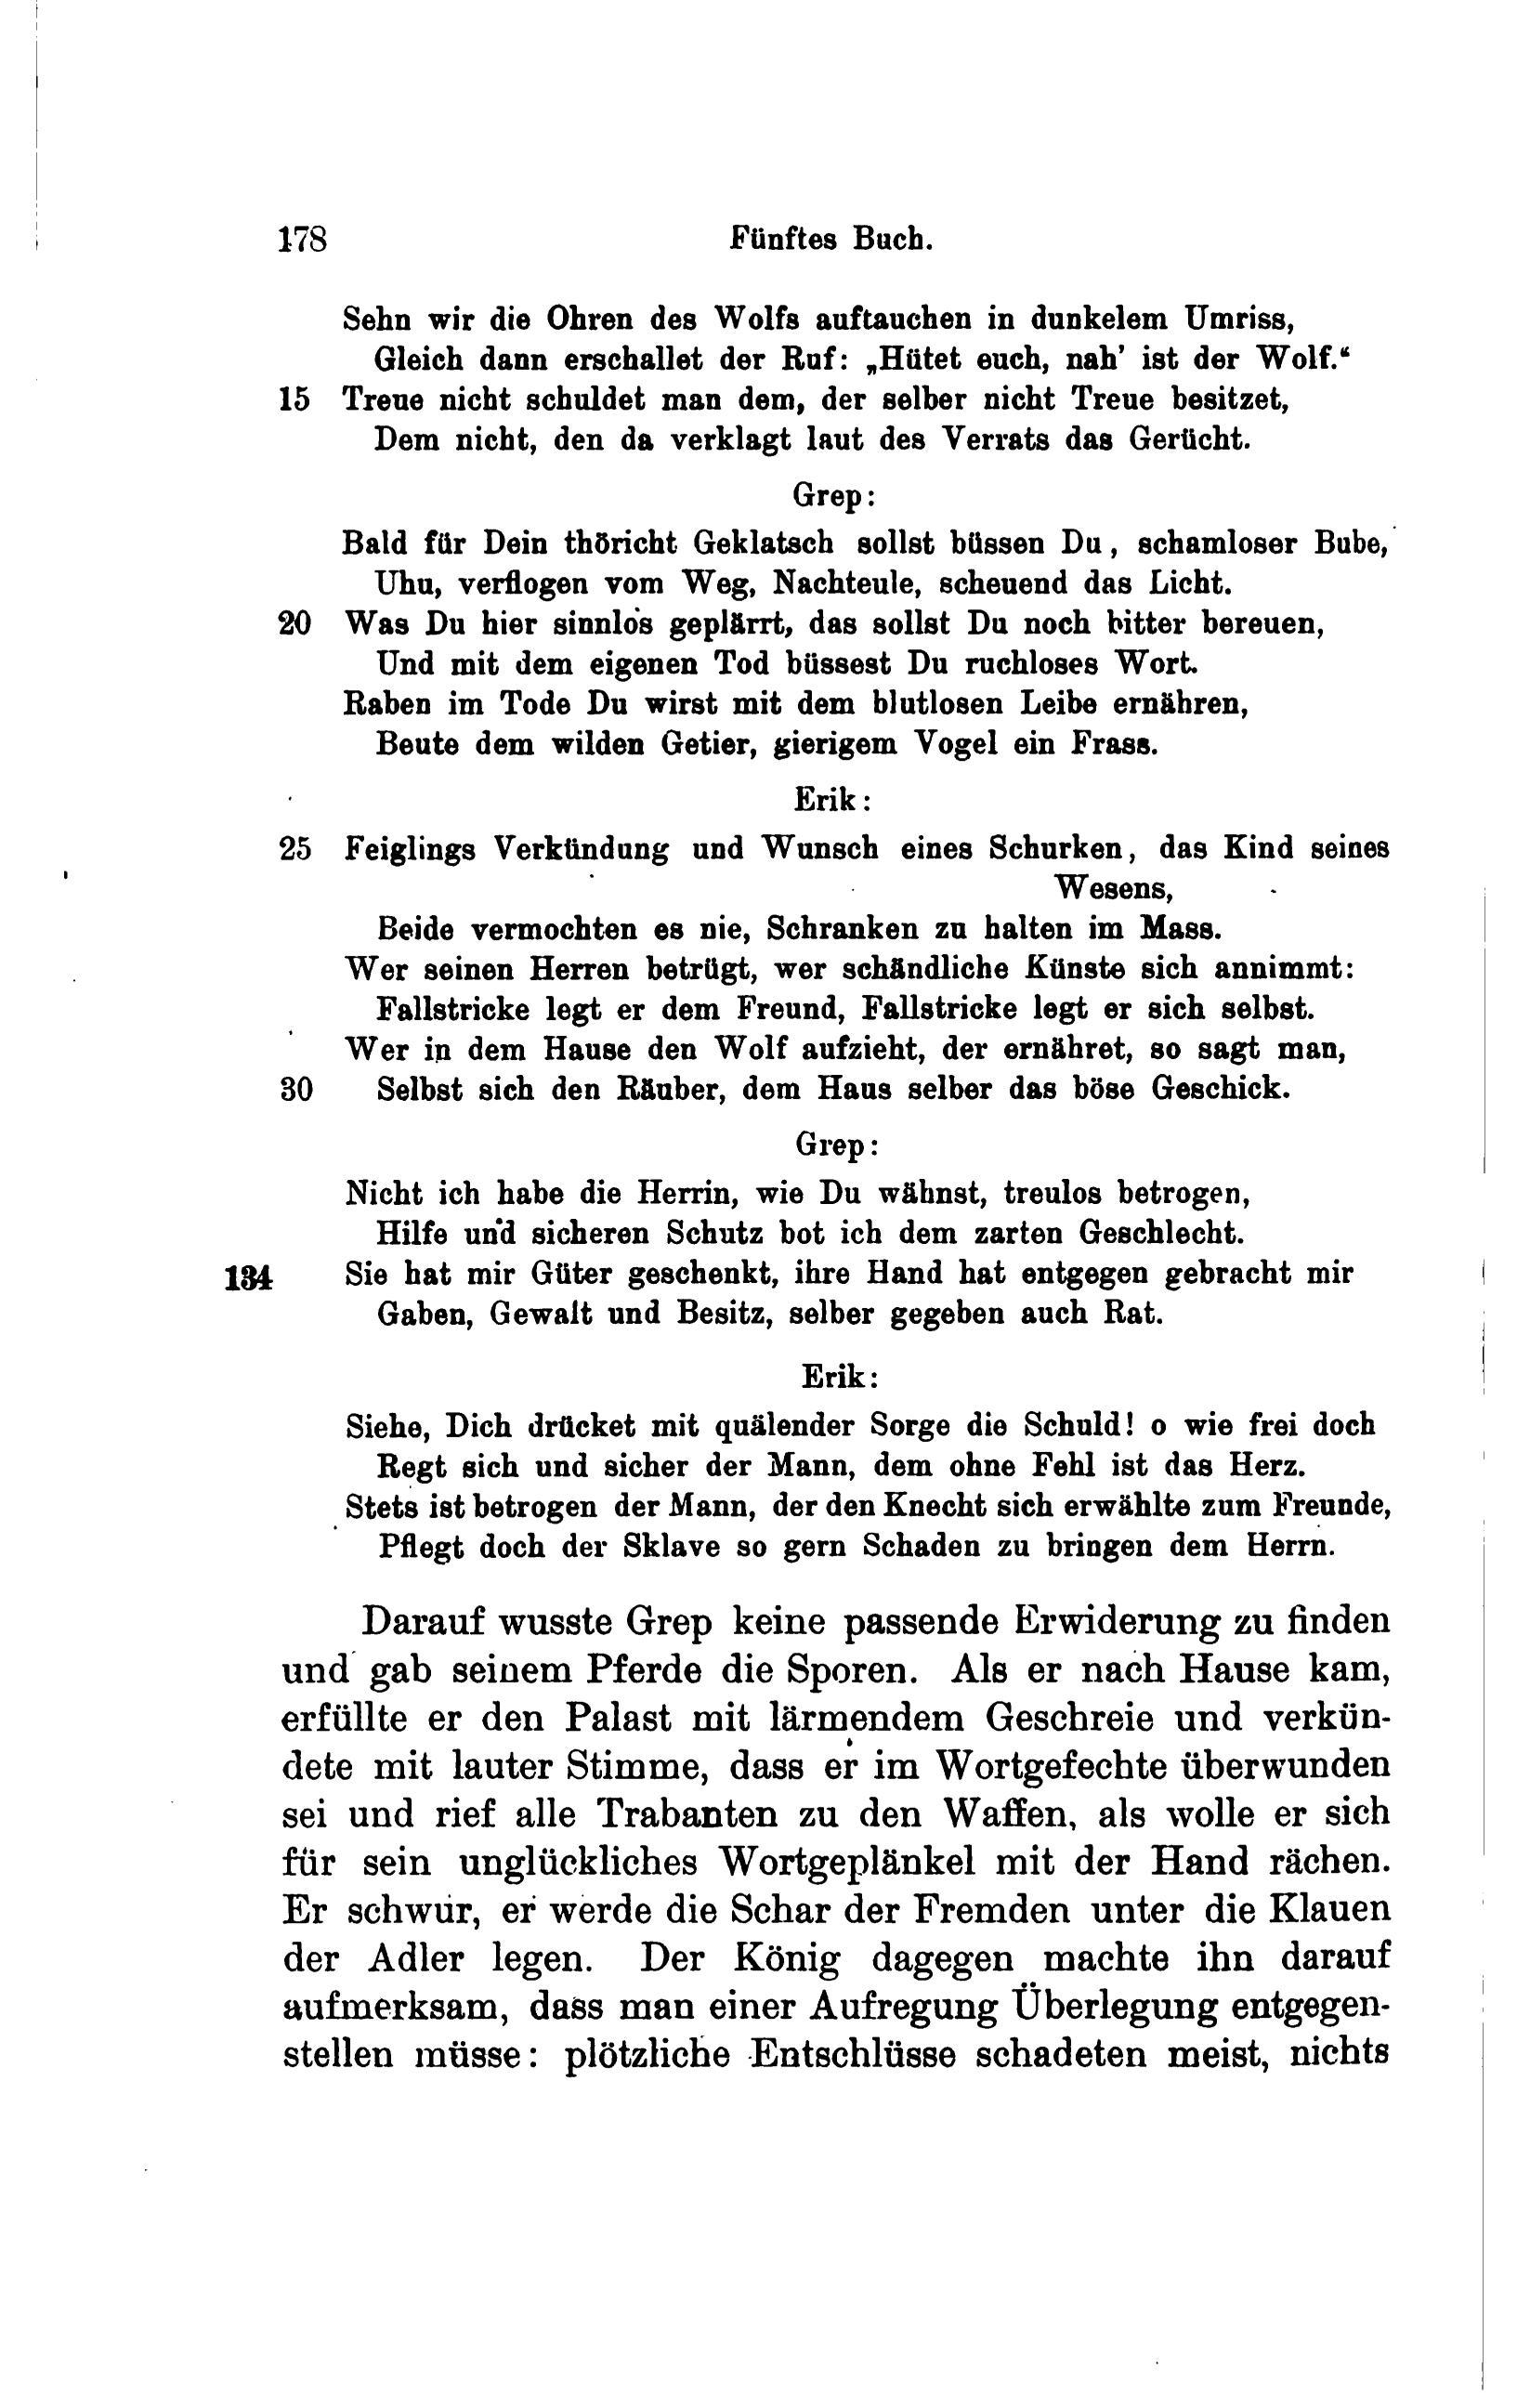 File:Erläuterungen zu den ersten neun Büchern der Dänischen ...